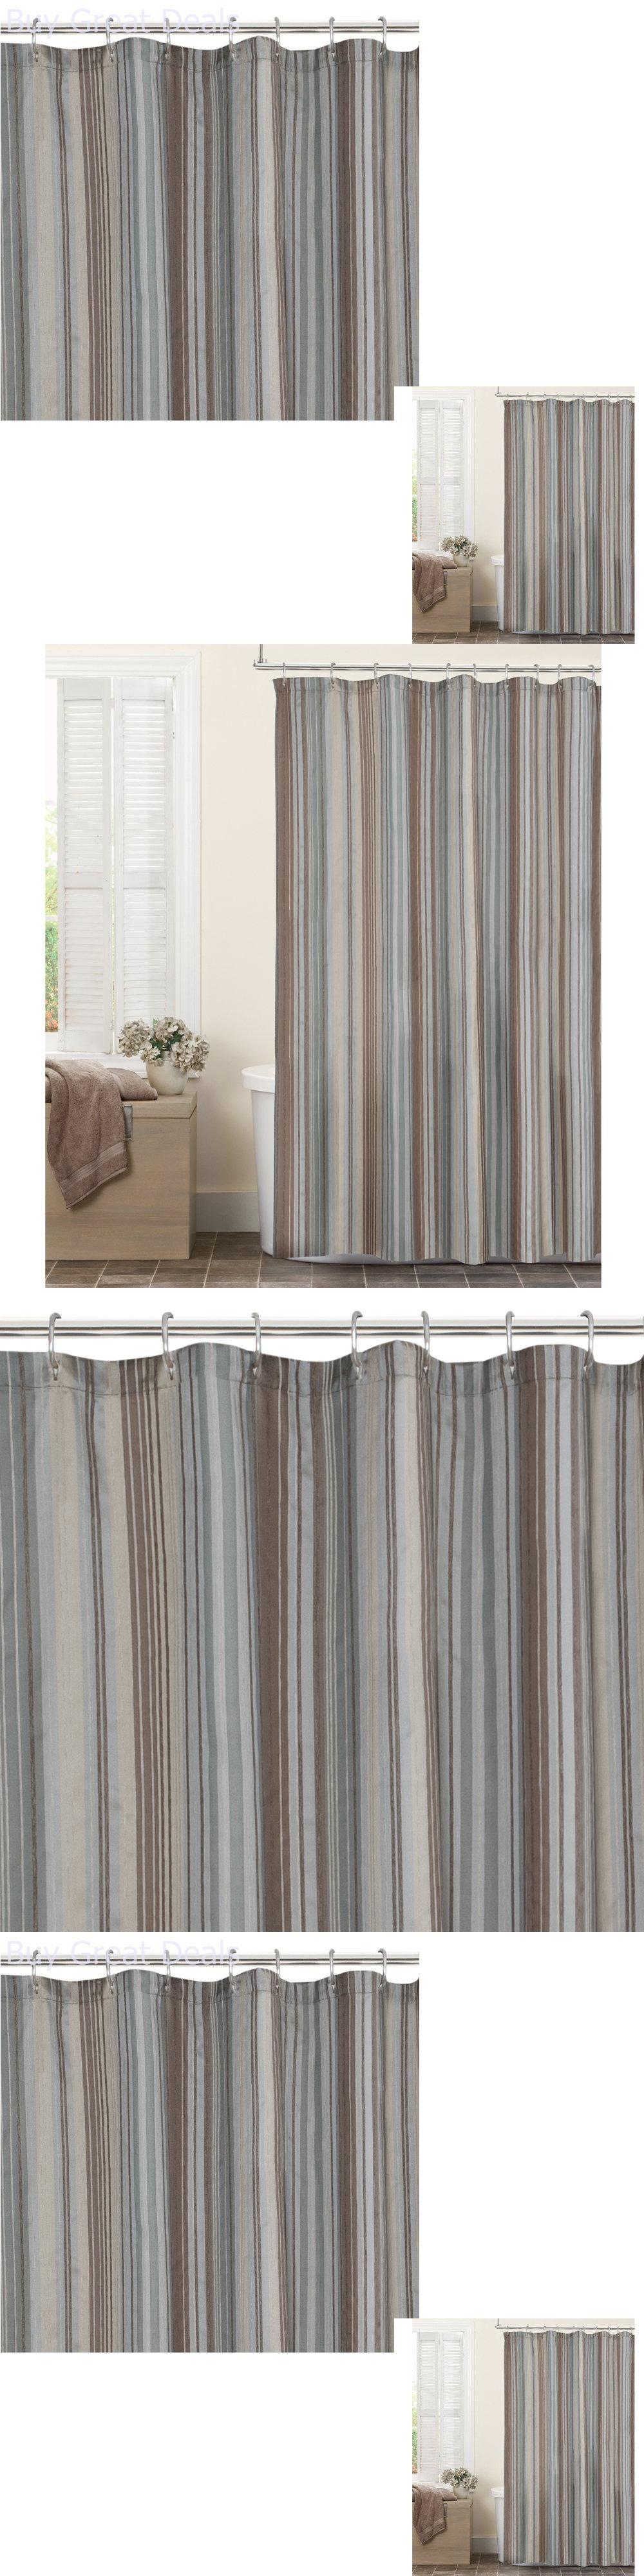 Shower Curtains 20441 Blue Brown Tan Fabric Curtain Bathroom Bath Tub BUY